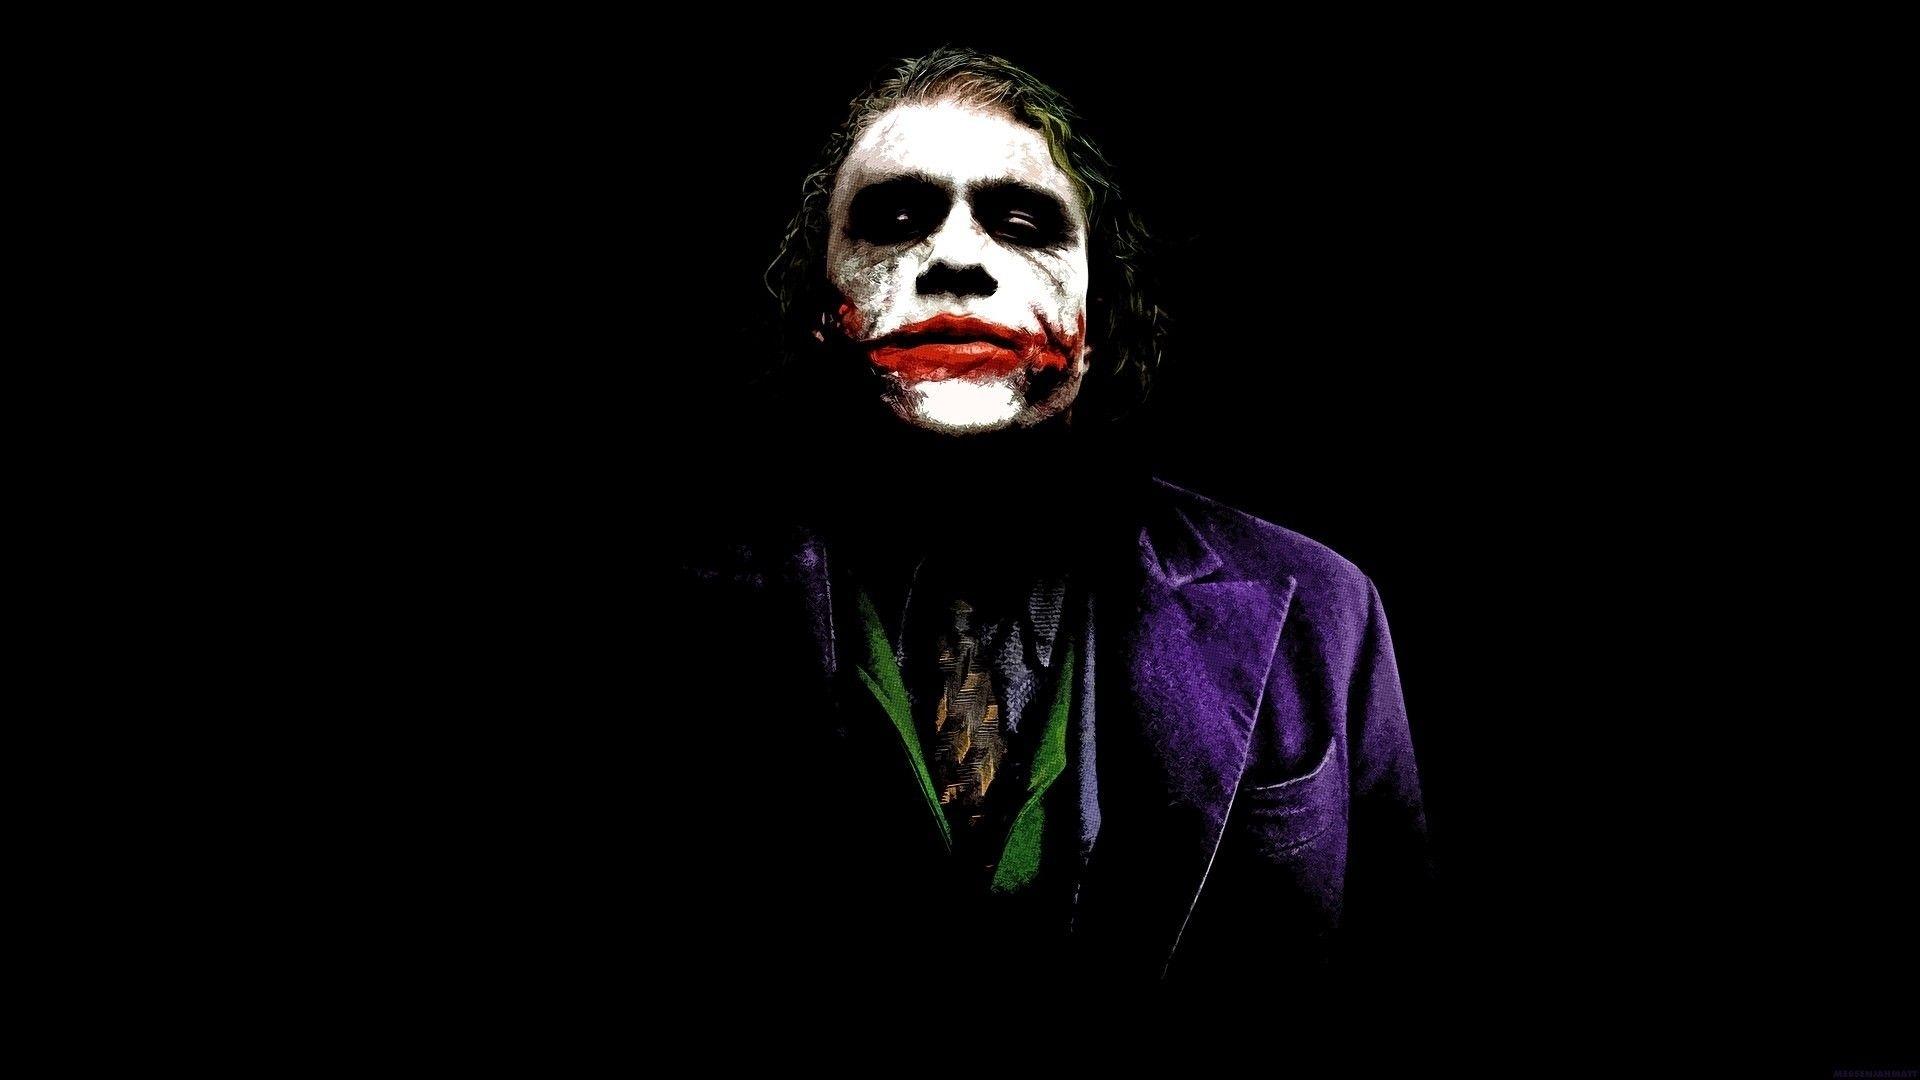 batman black the joker clown masks batman the dark knight black